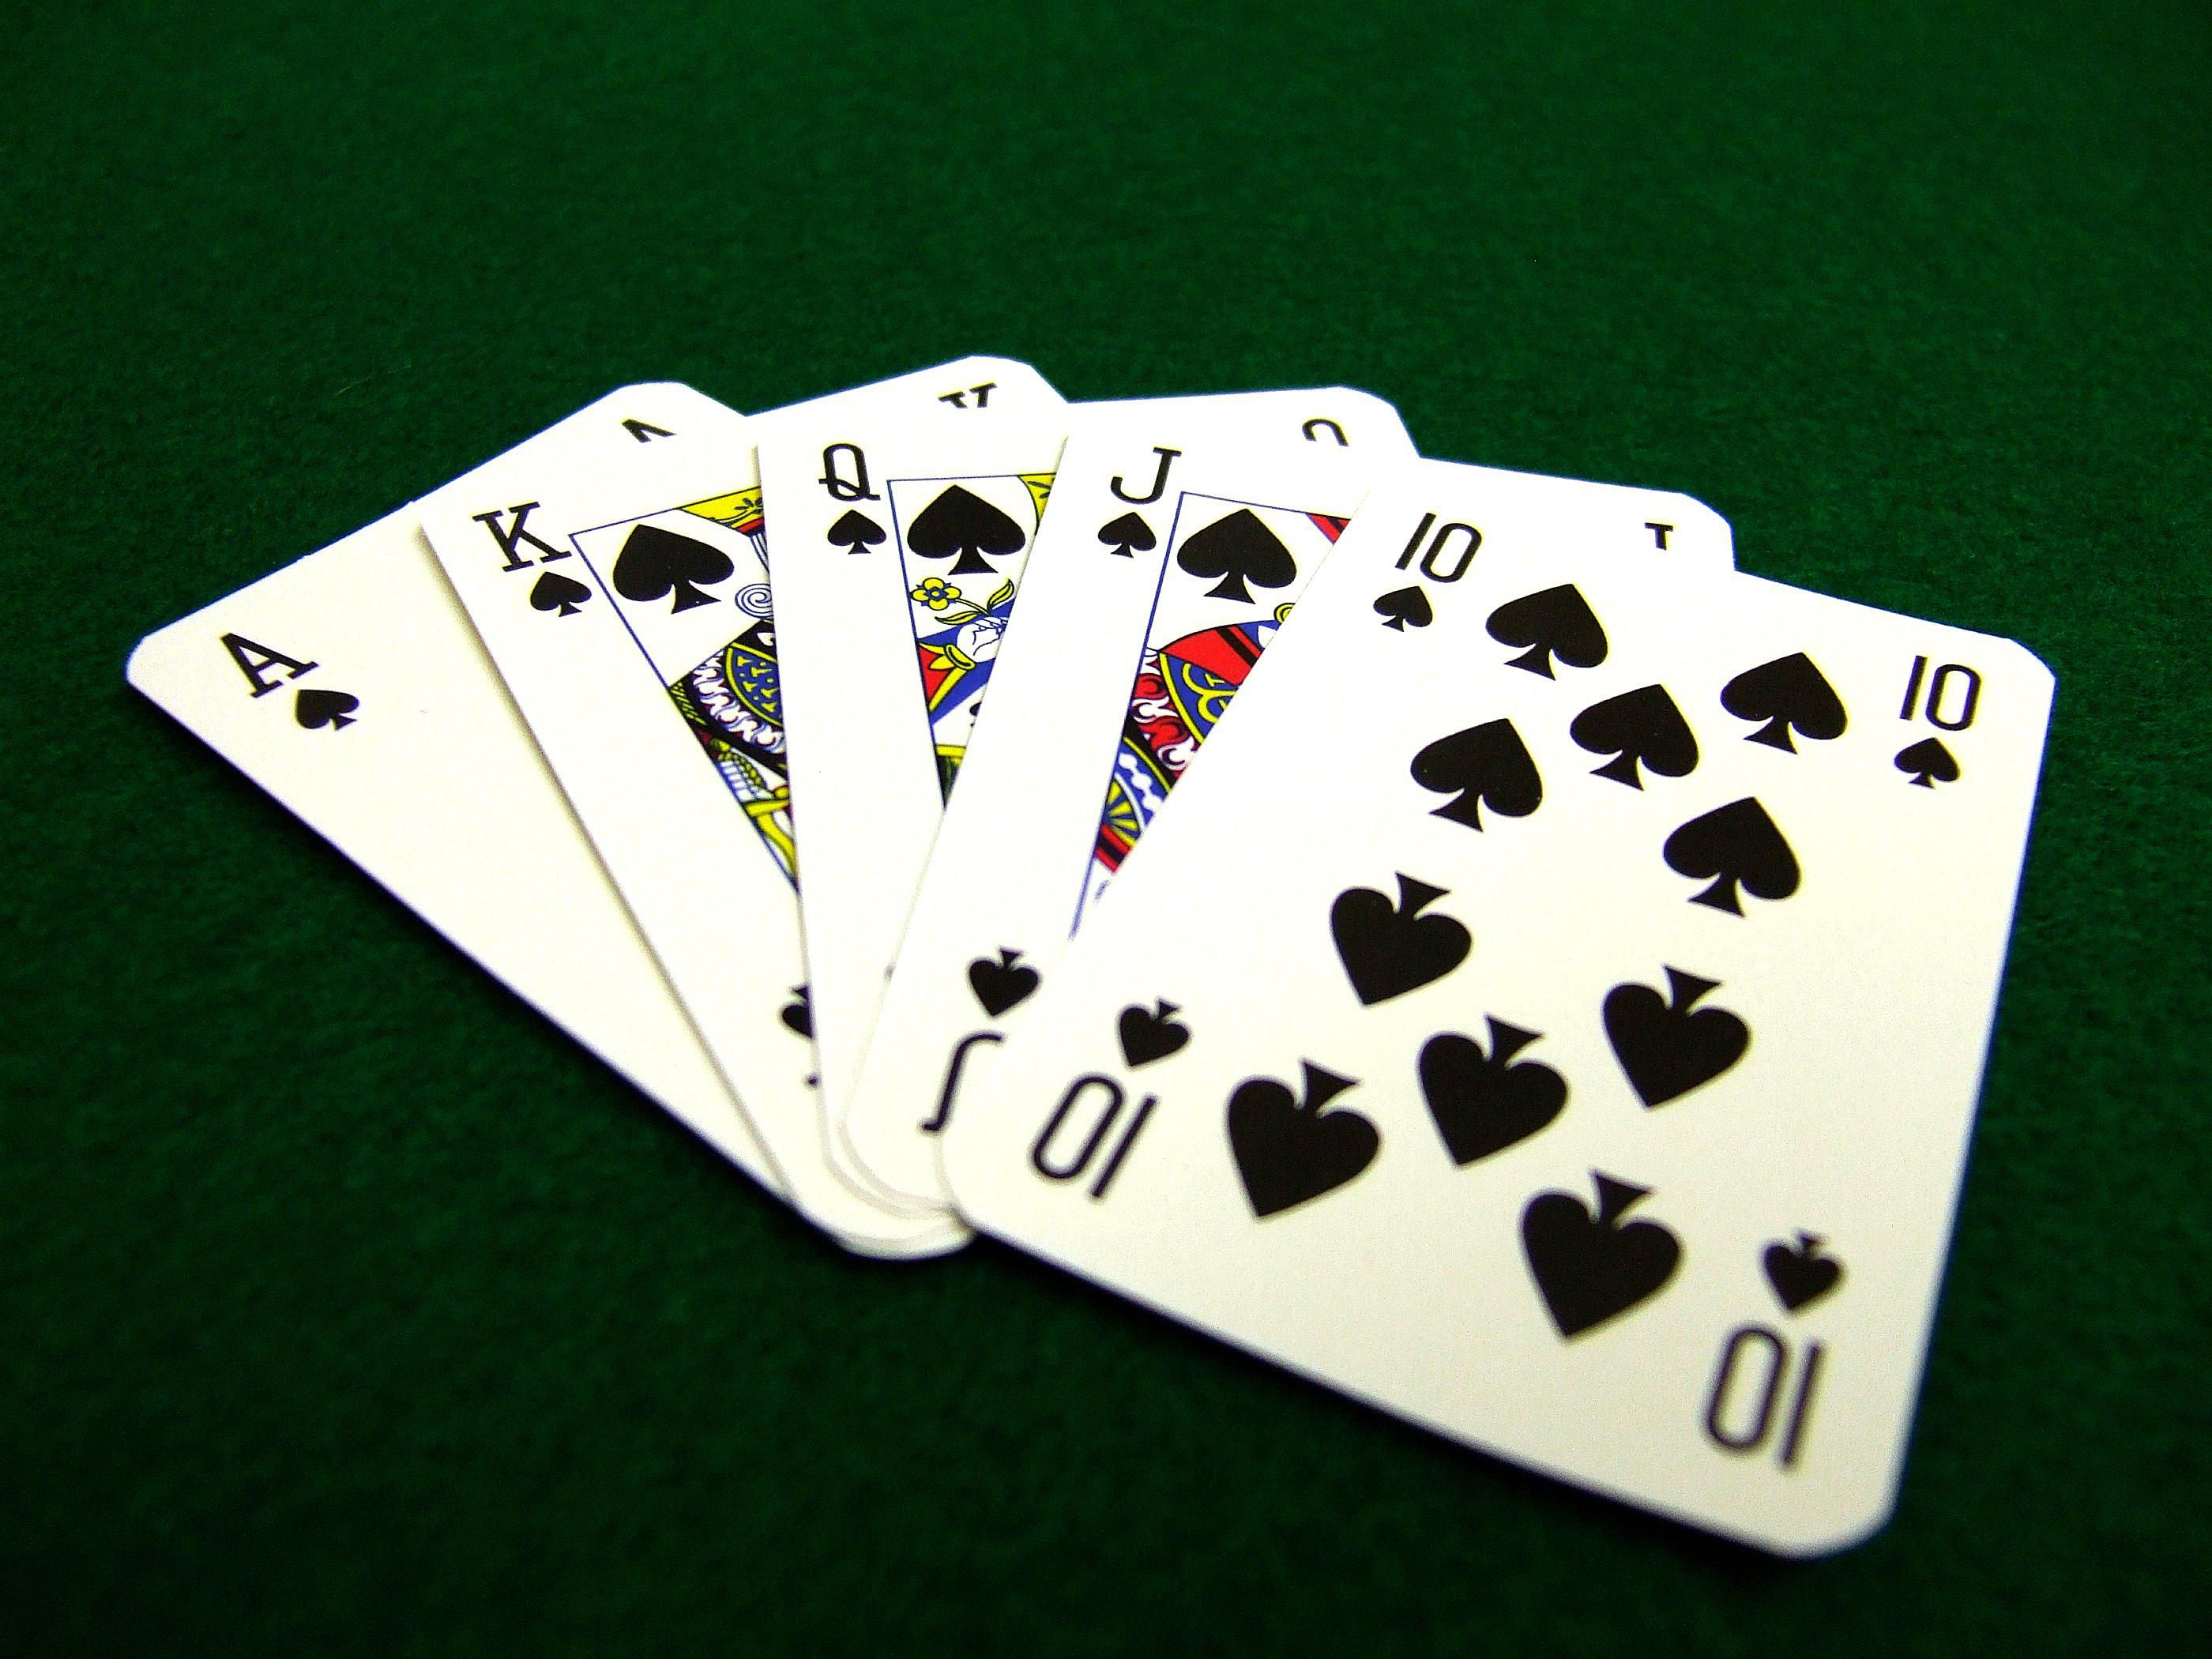 Hasenpfeffer card game rules for Charity motors bridge card